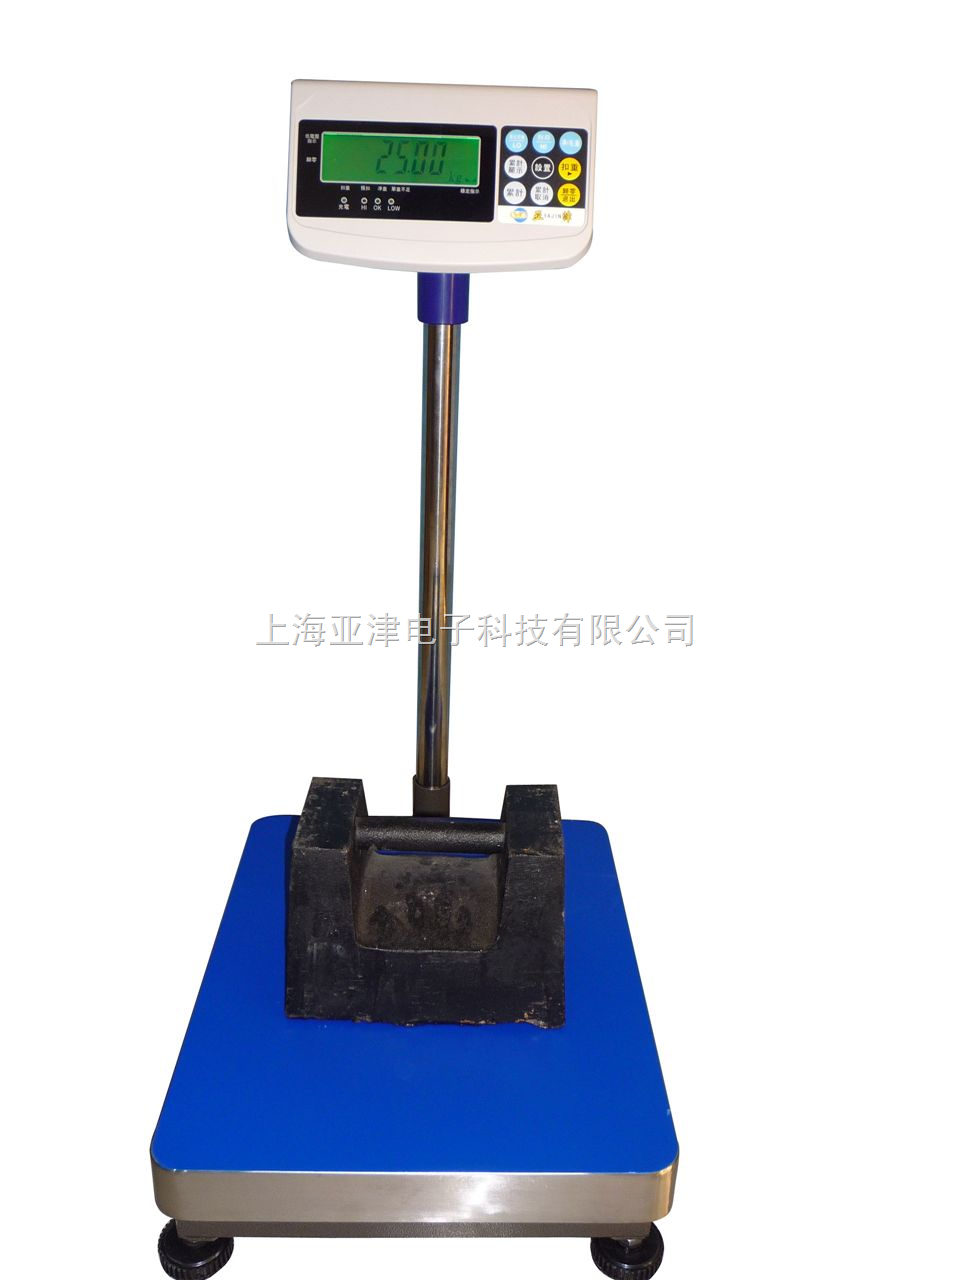 TCS-150KG400*500MM台面电子磅秤